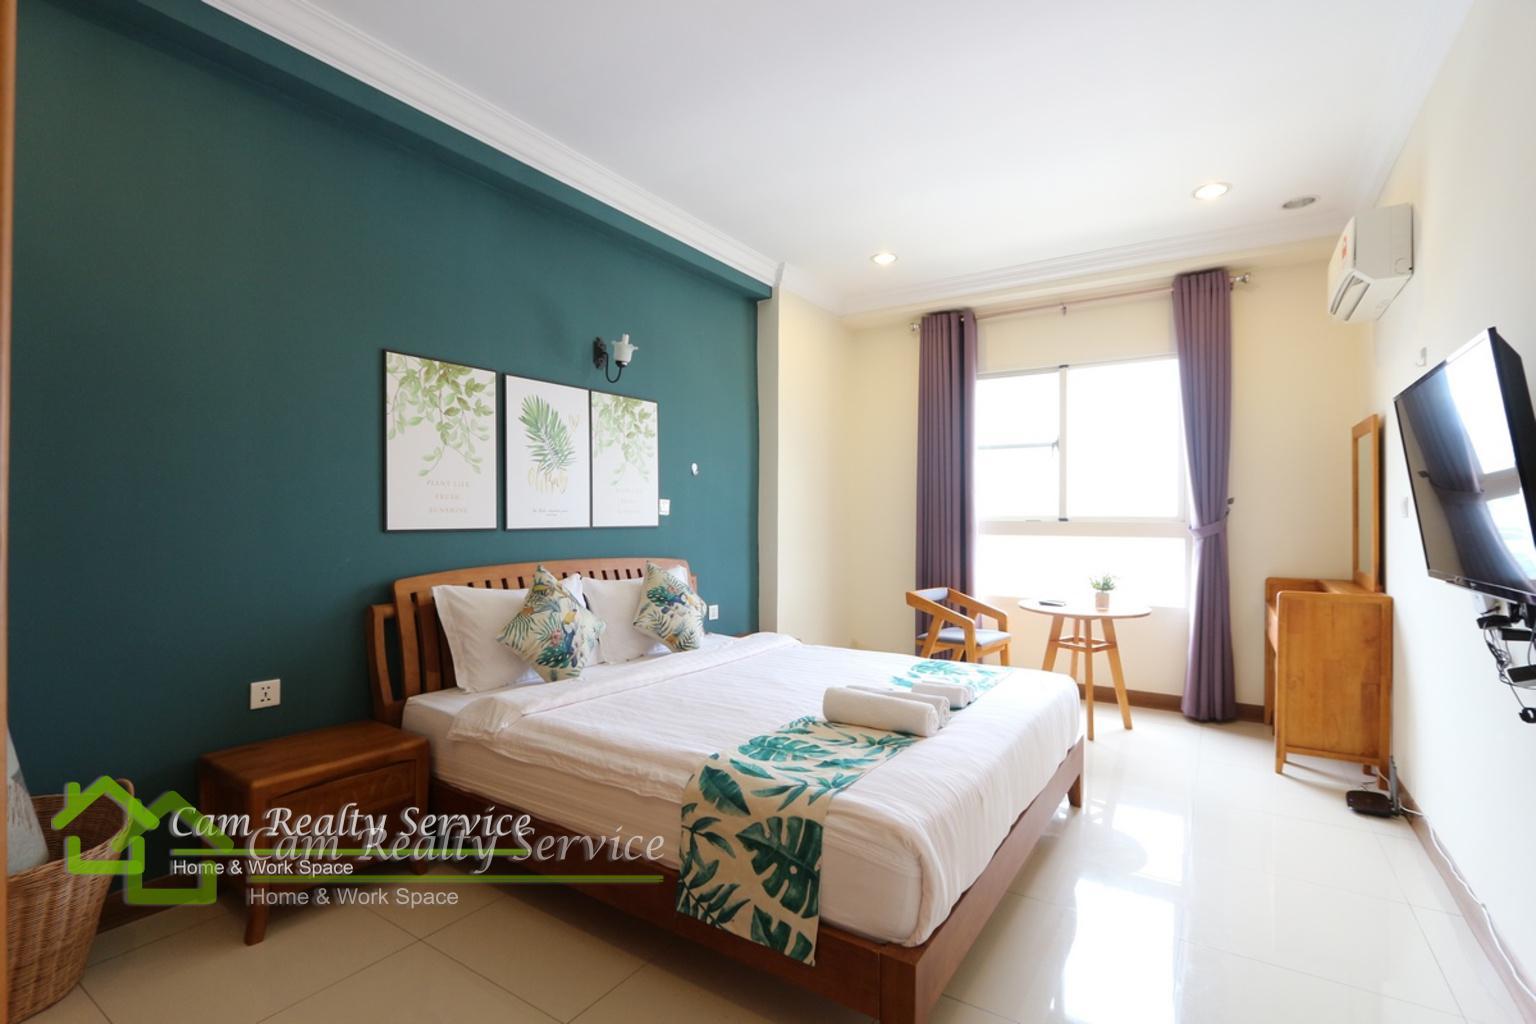 bedroom.JPG1 (1)